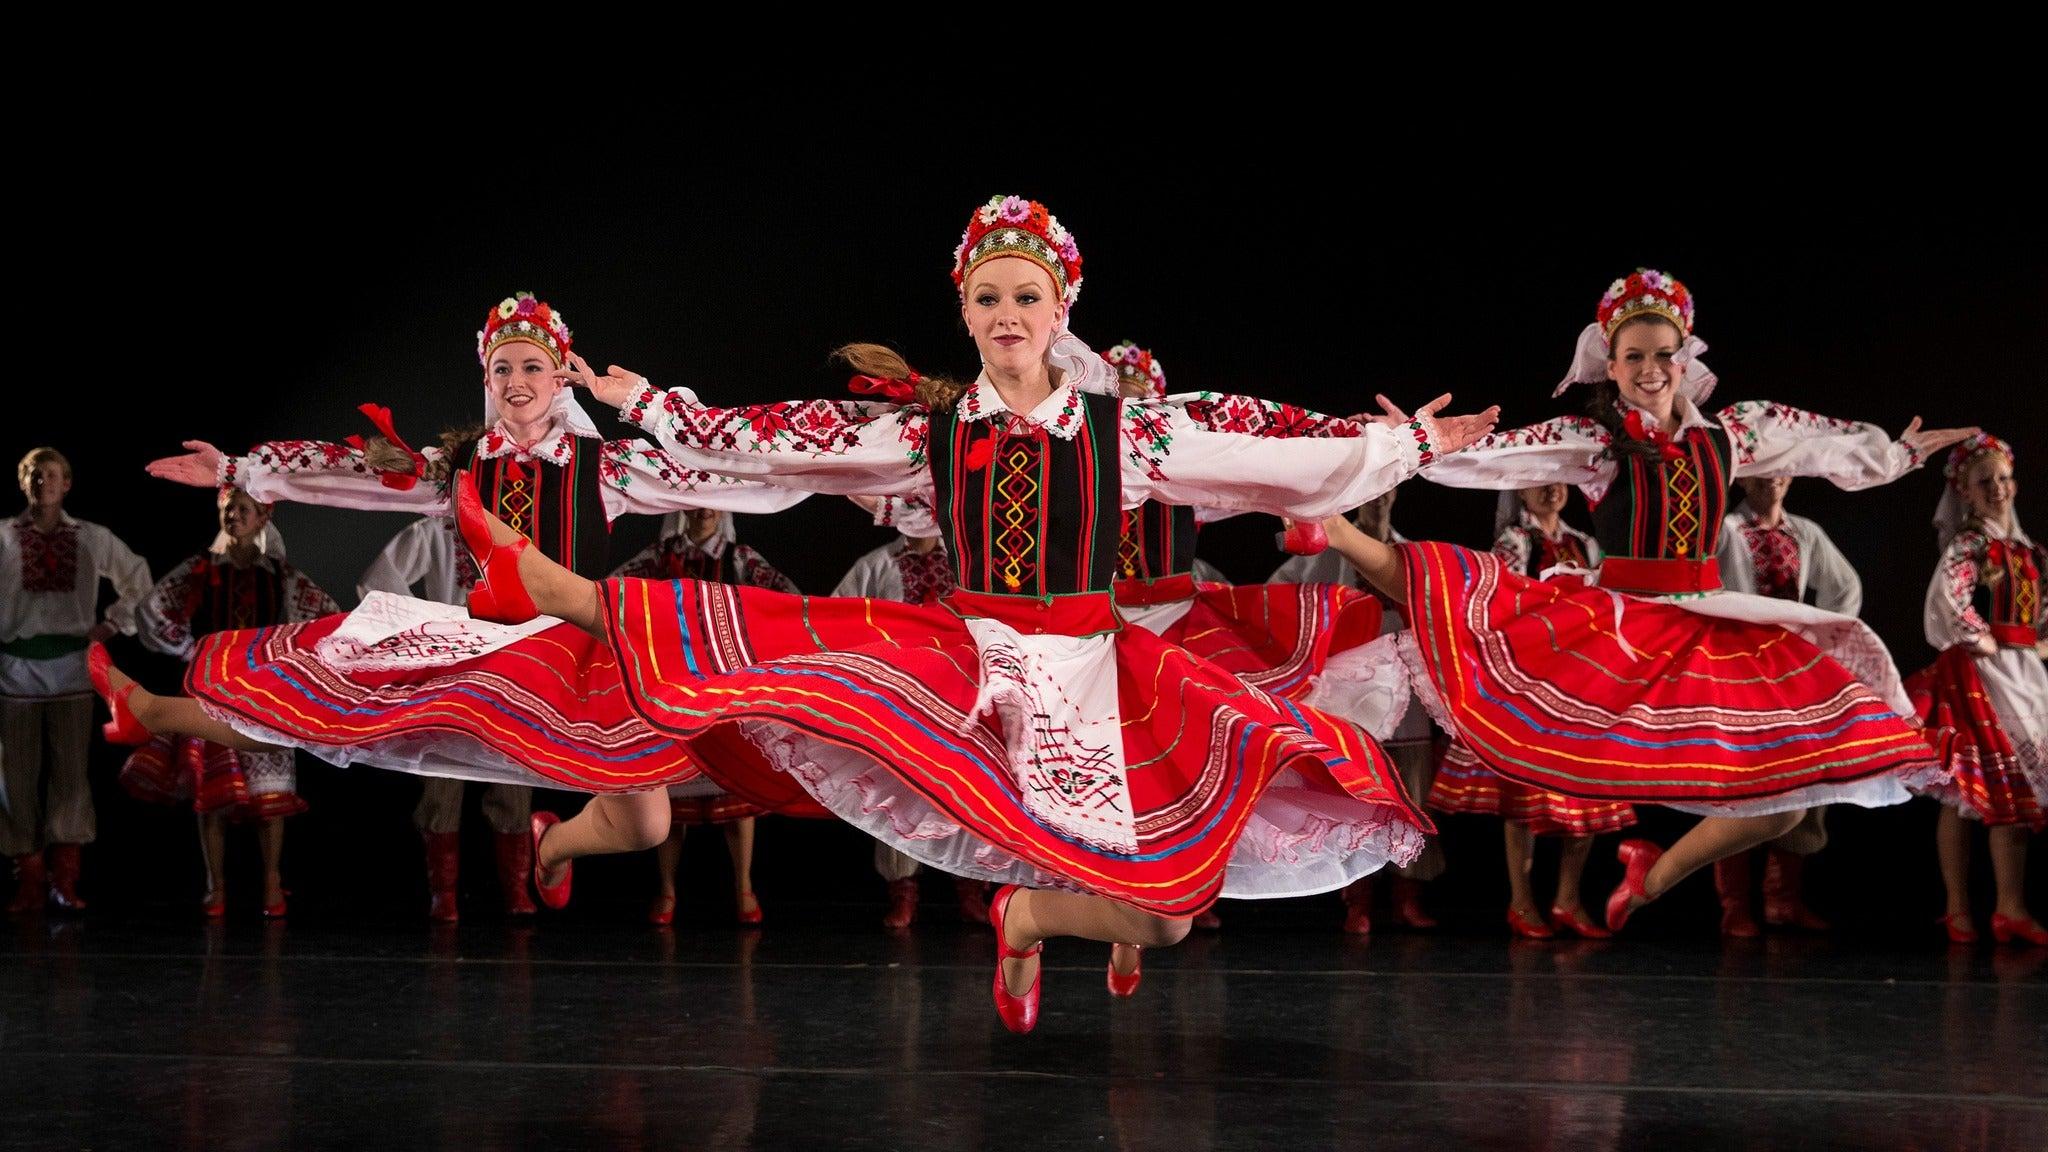 Byu Folk Dance Ensemble